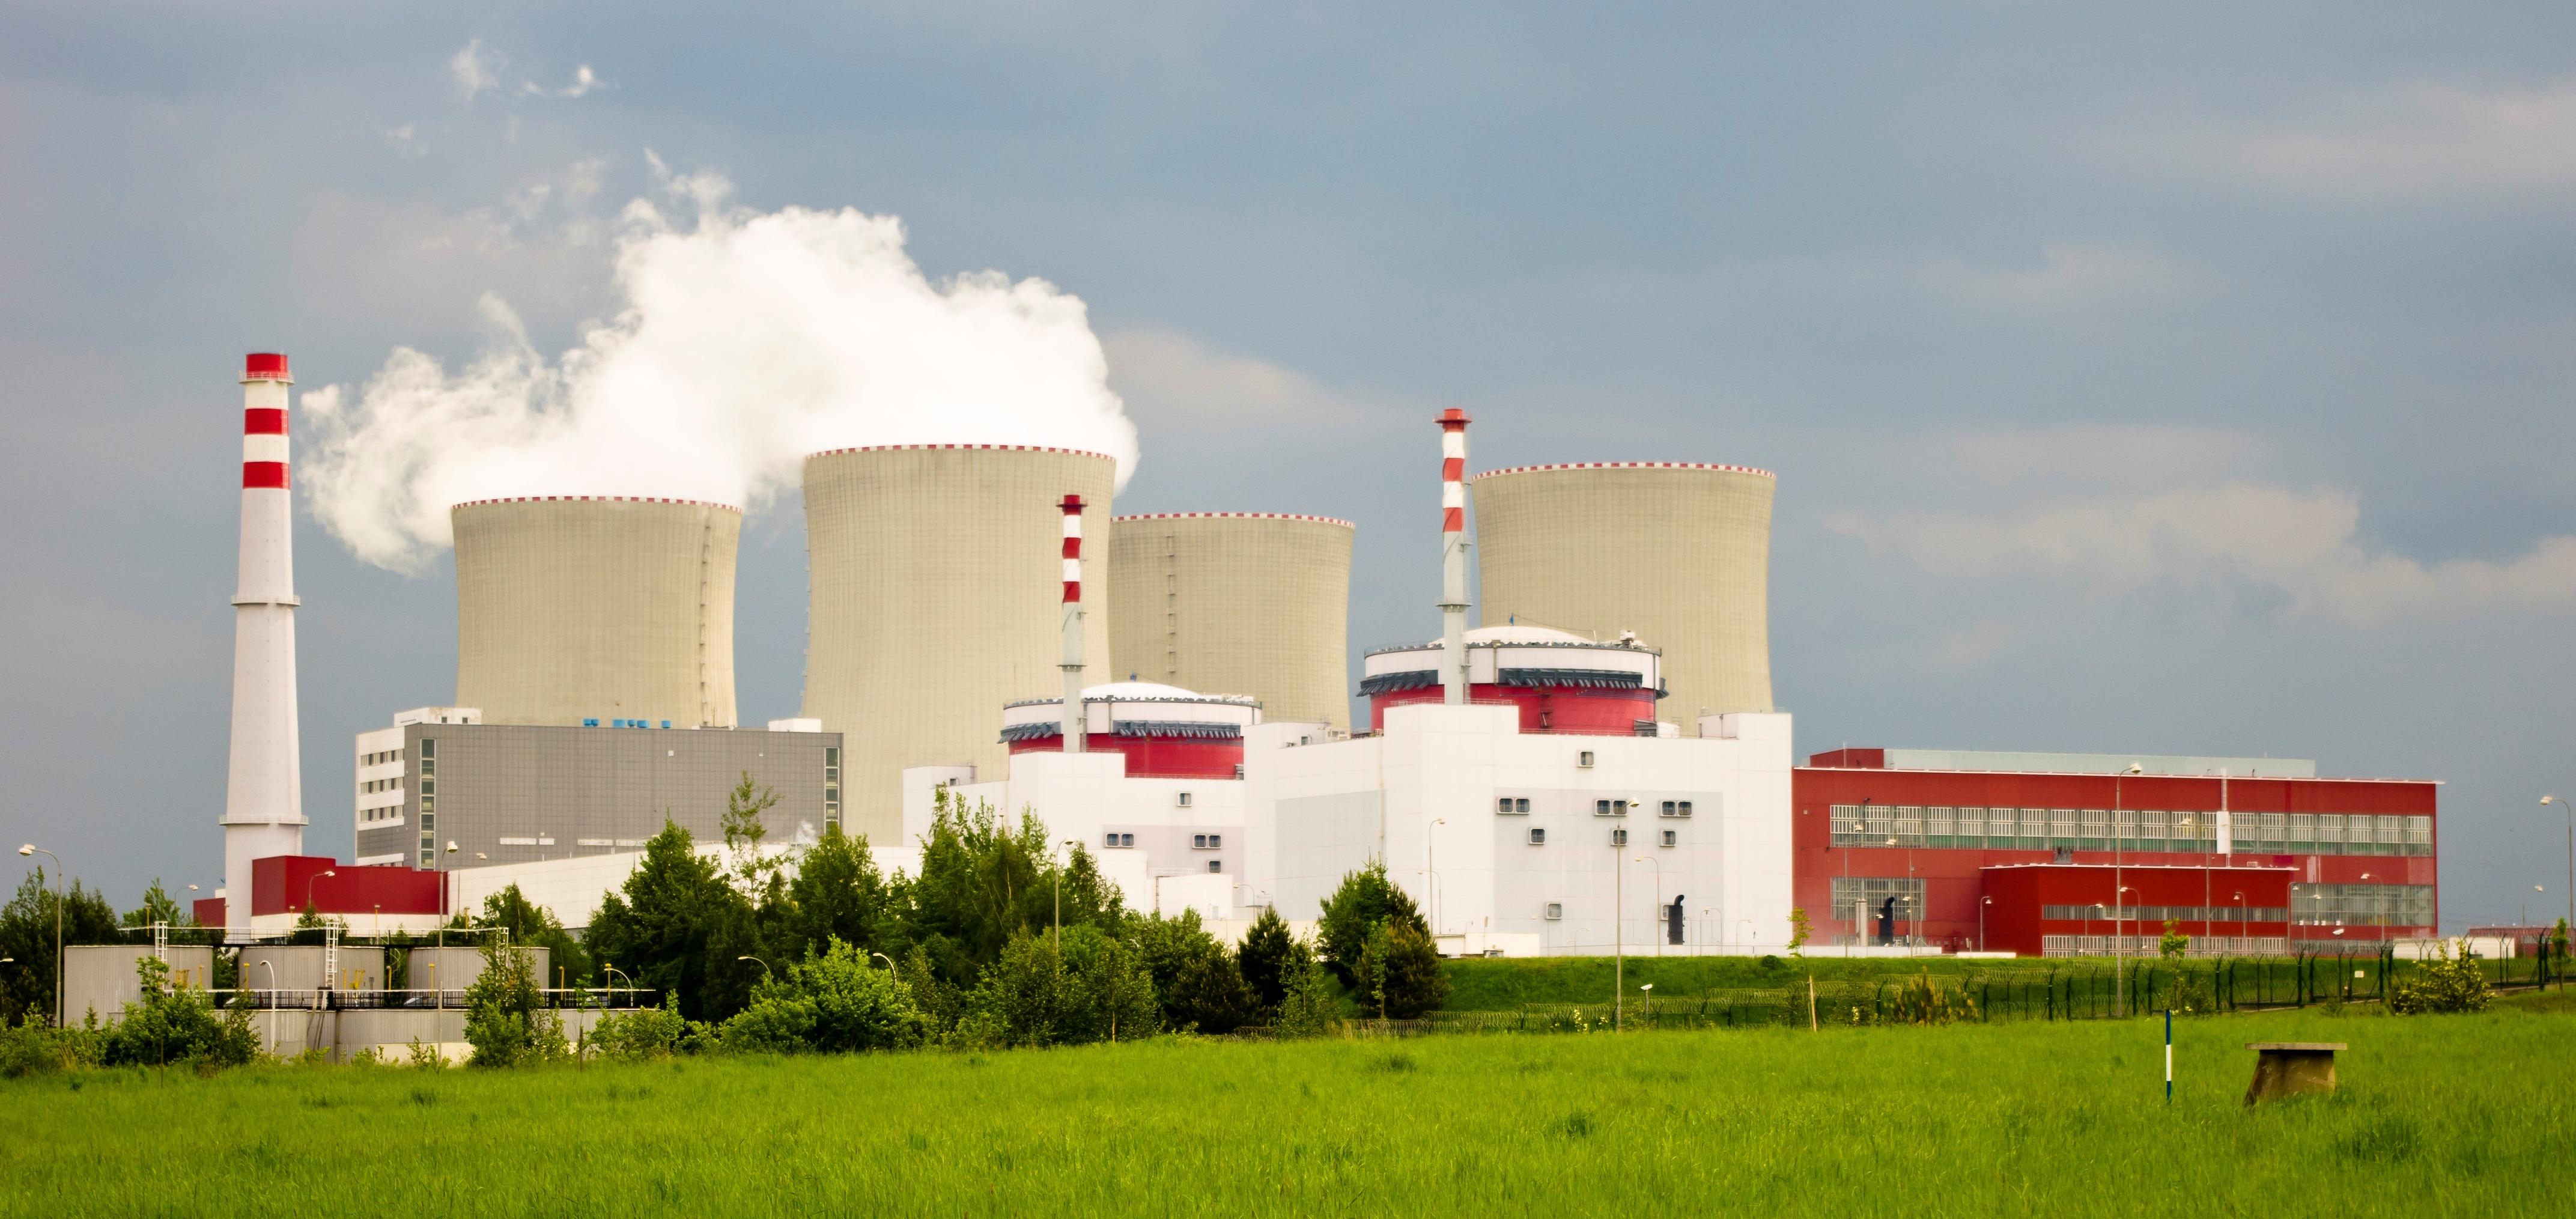 Rekord v JE Temelín – za tři hodiny vyrobila energii pro 2 000 domácností